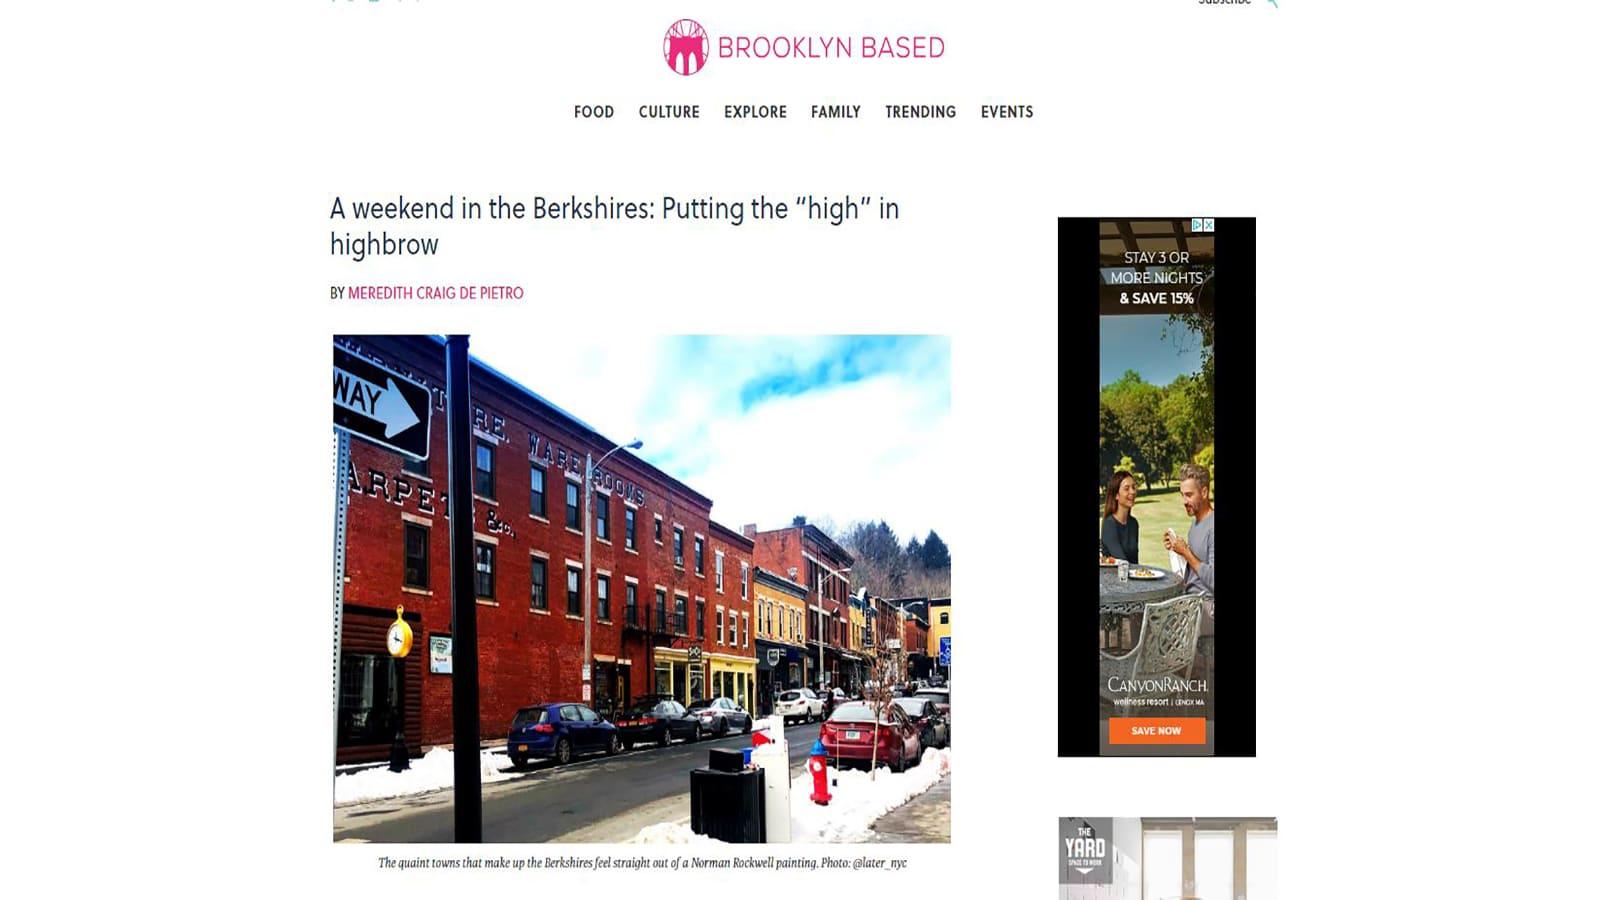 Brooklyn Based article